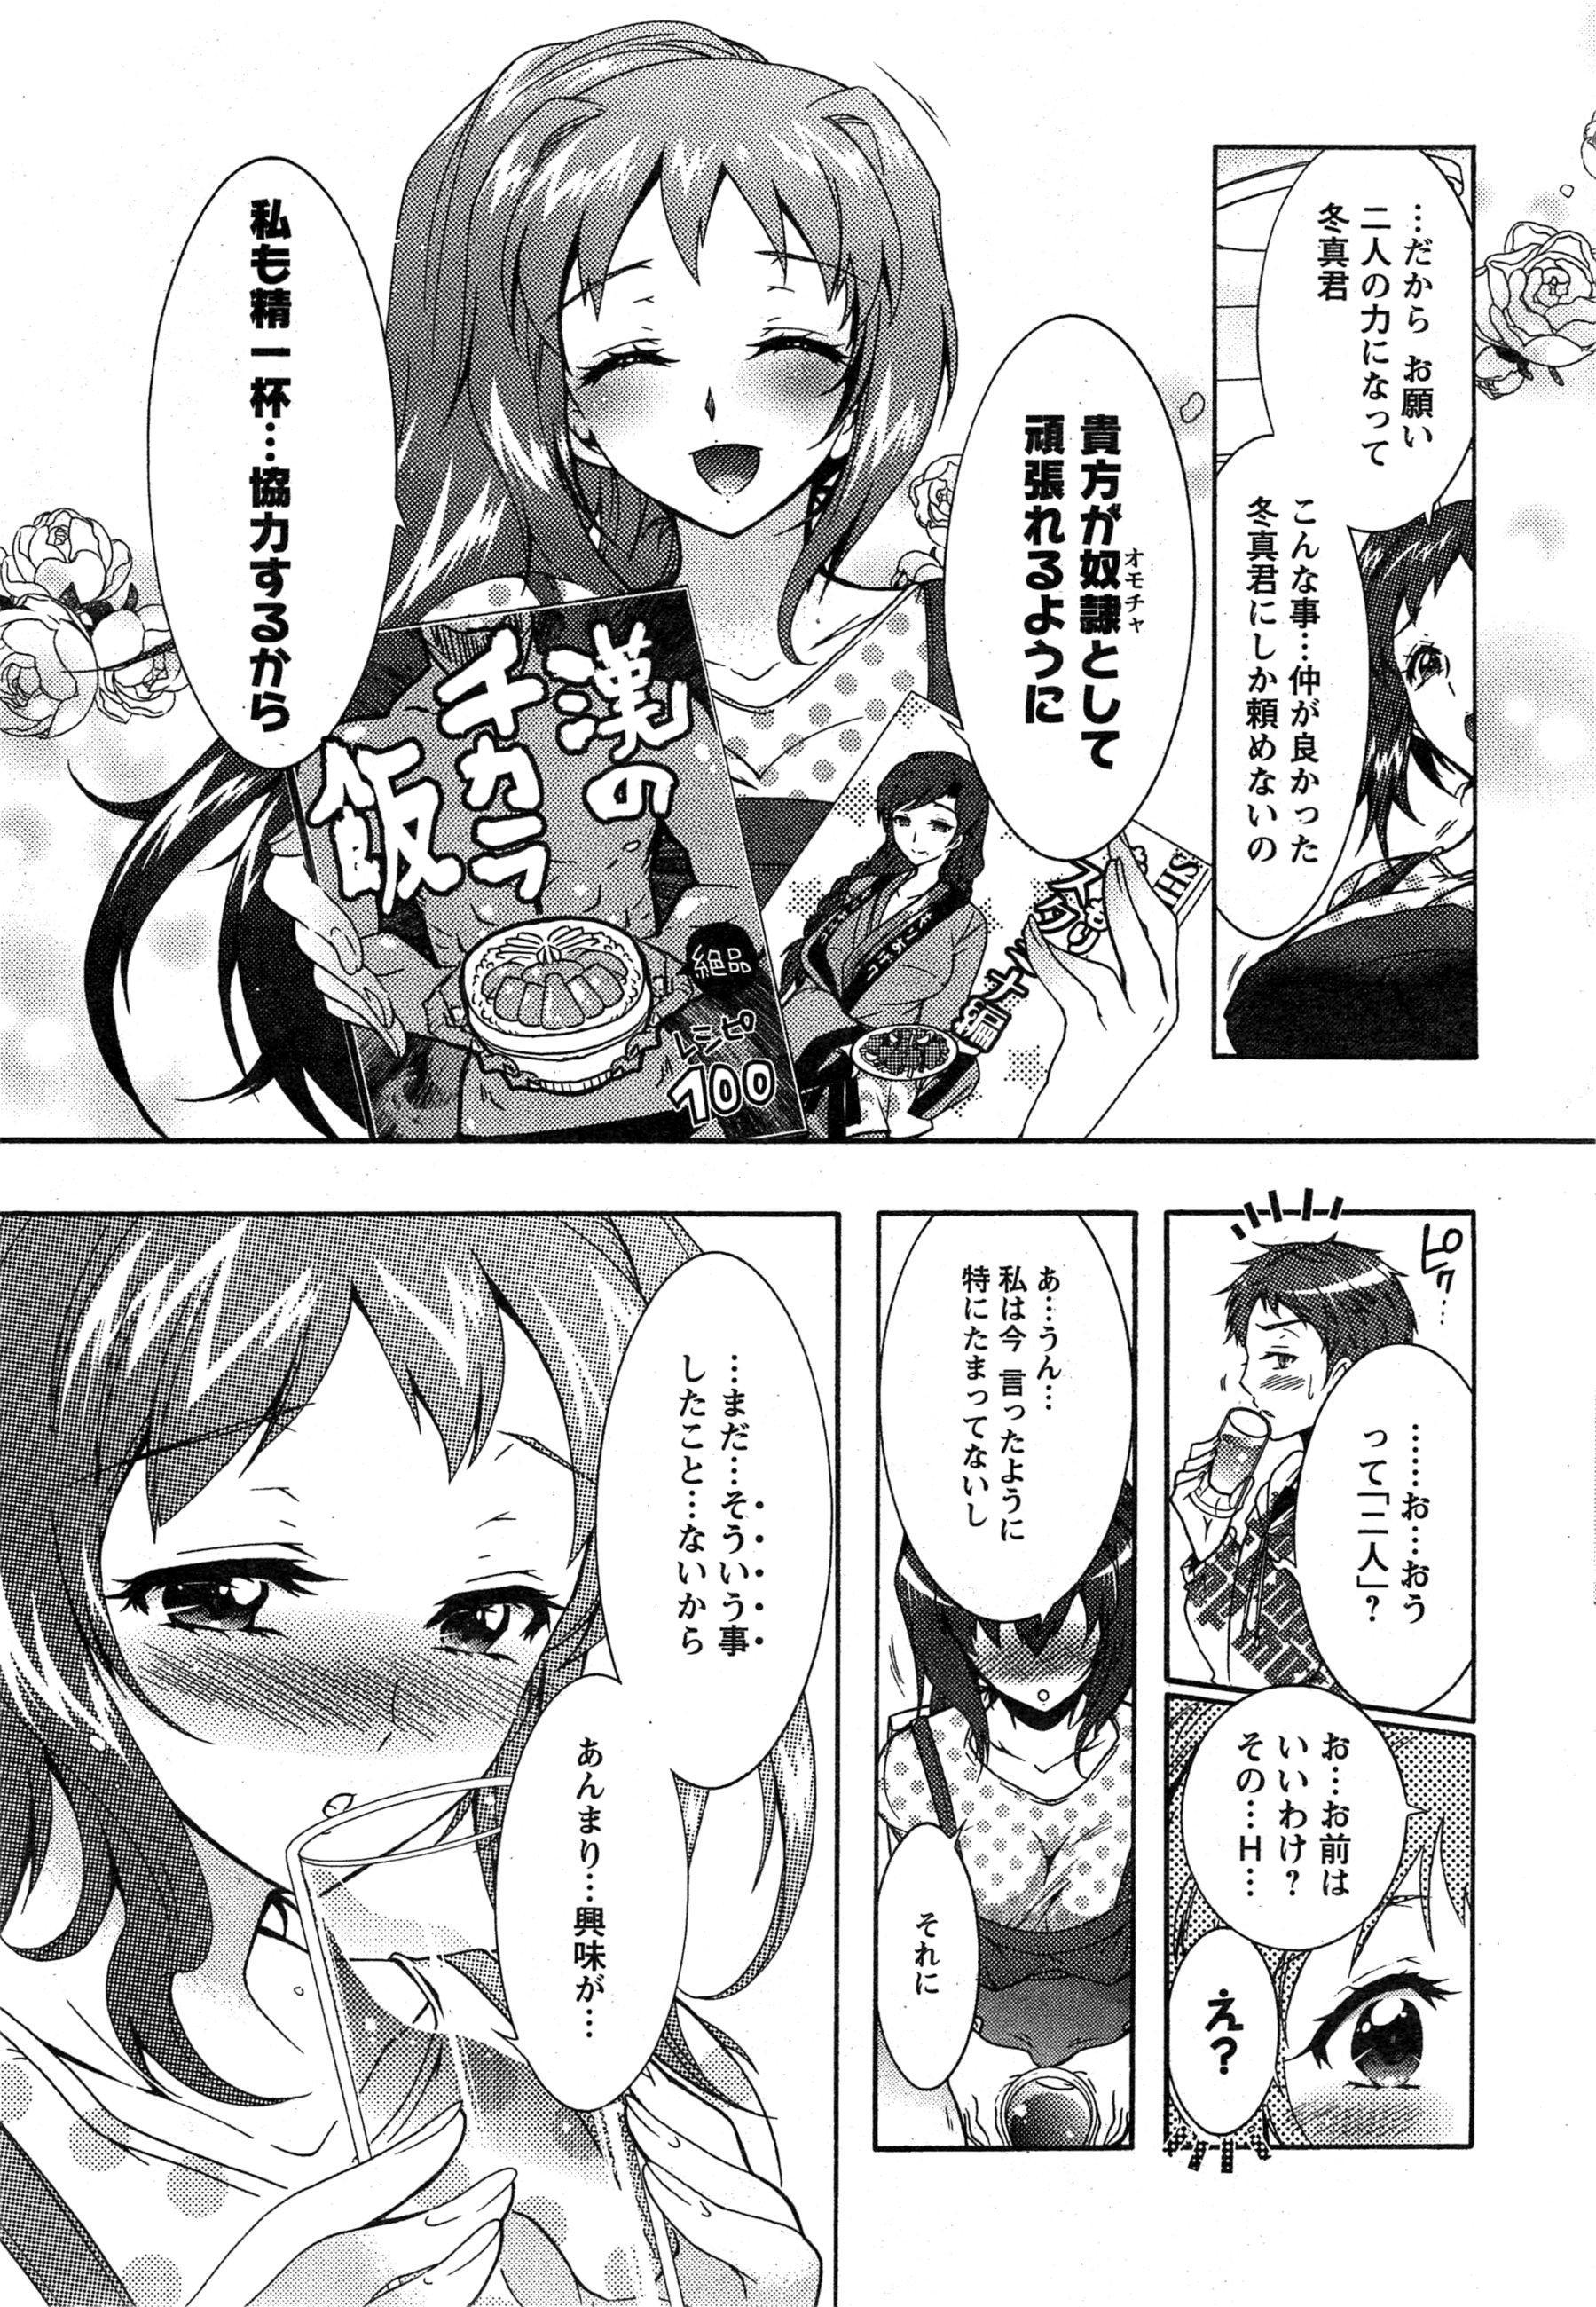 [Honda Arima] Sanshimai no Omocha - The Slave of Three Sisters Ch. 1-6 29